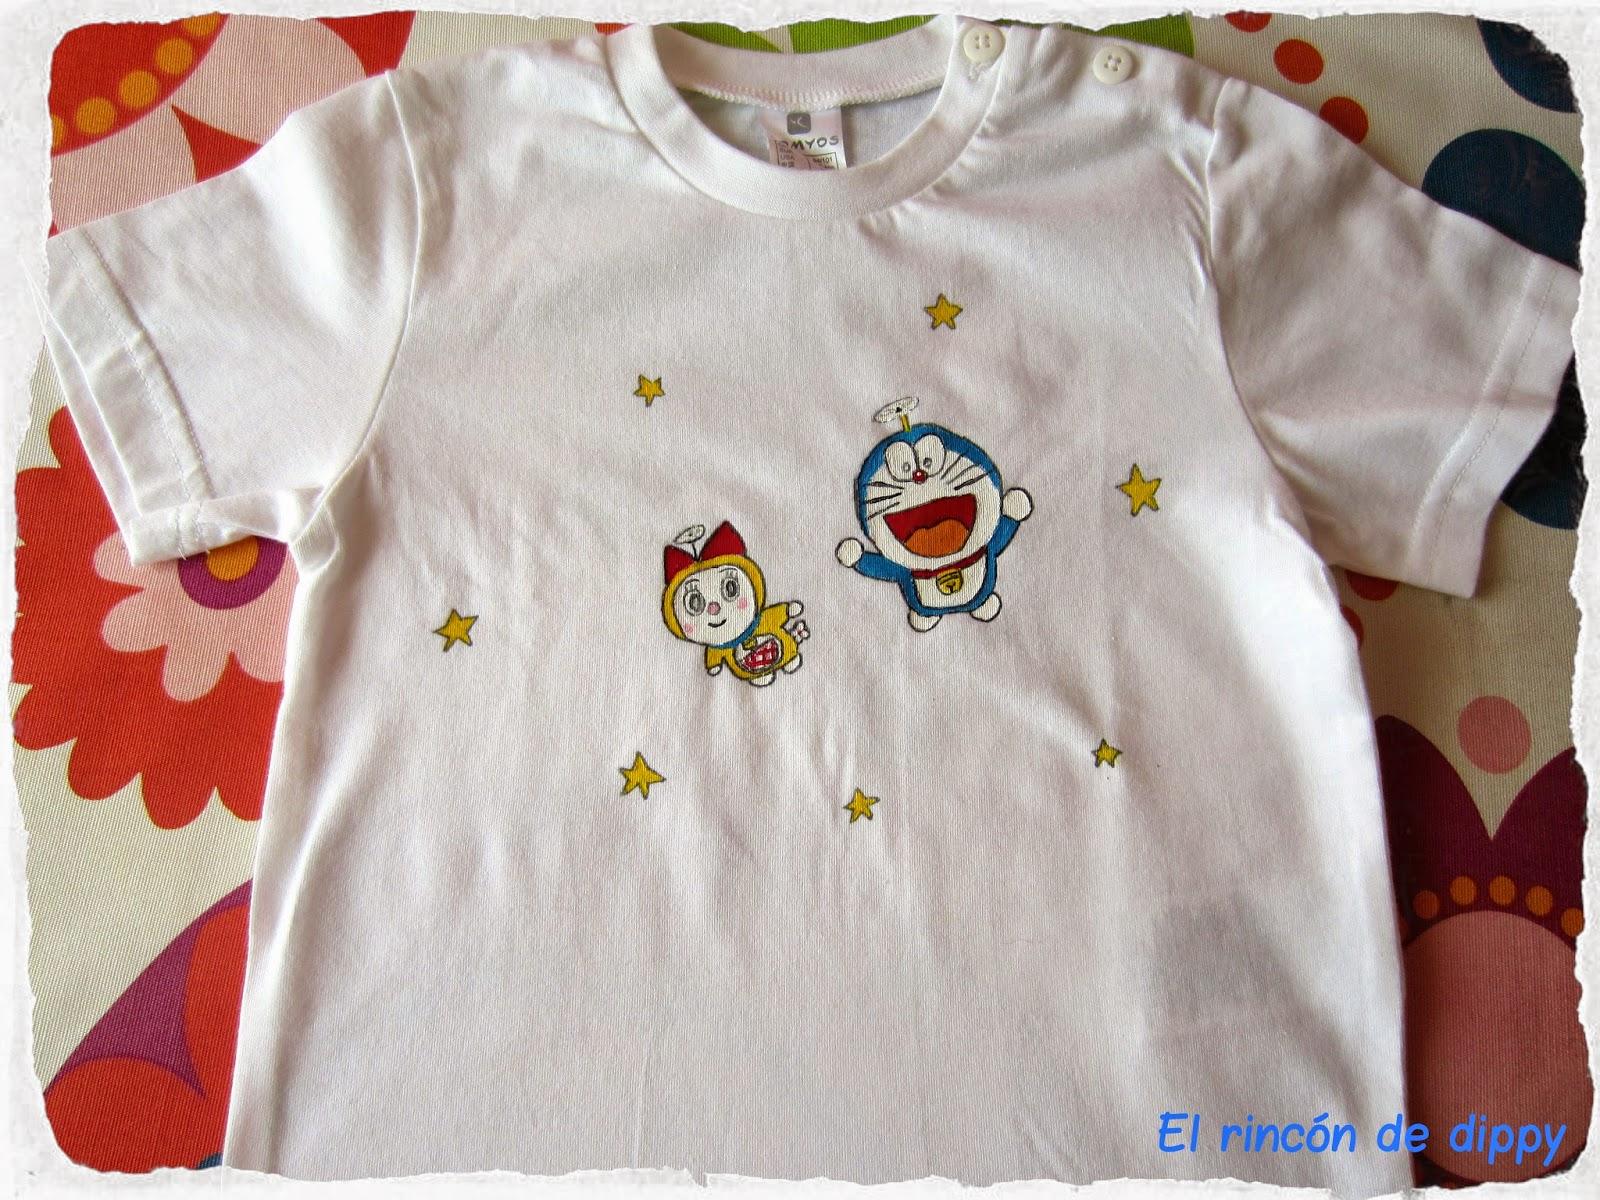 Camiseta pintada Doraemon y Dorami